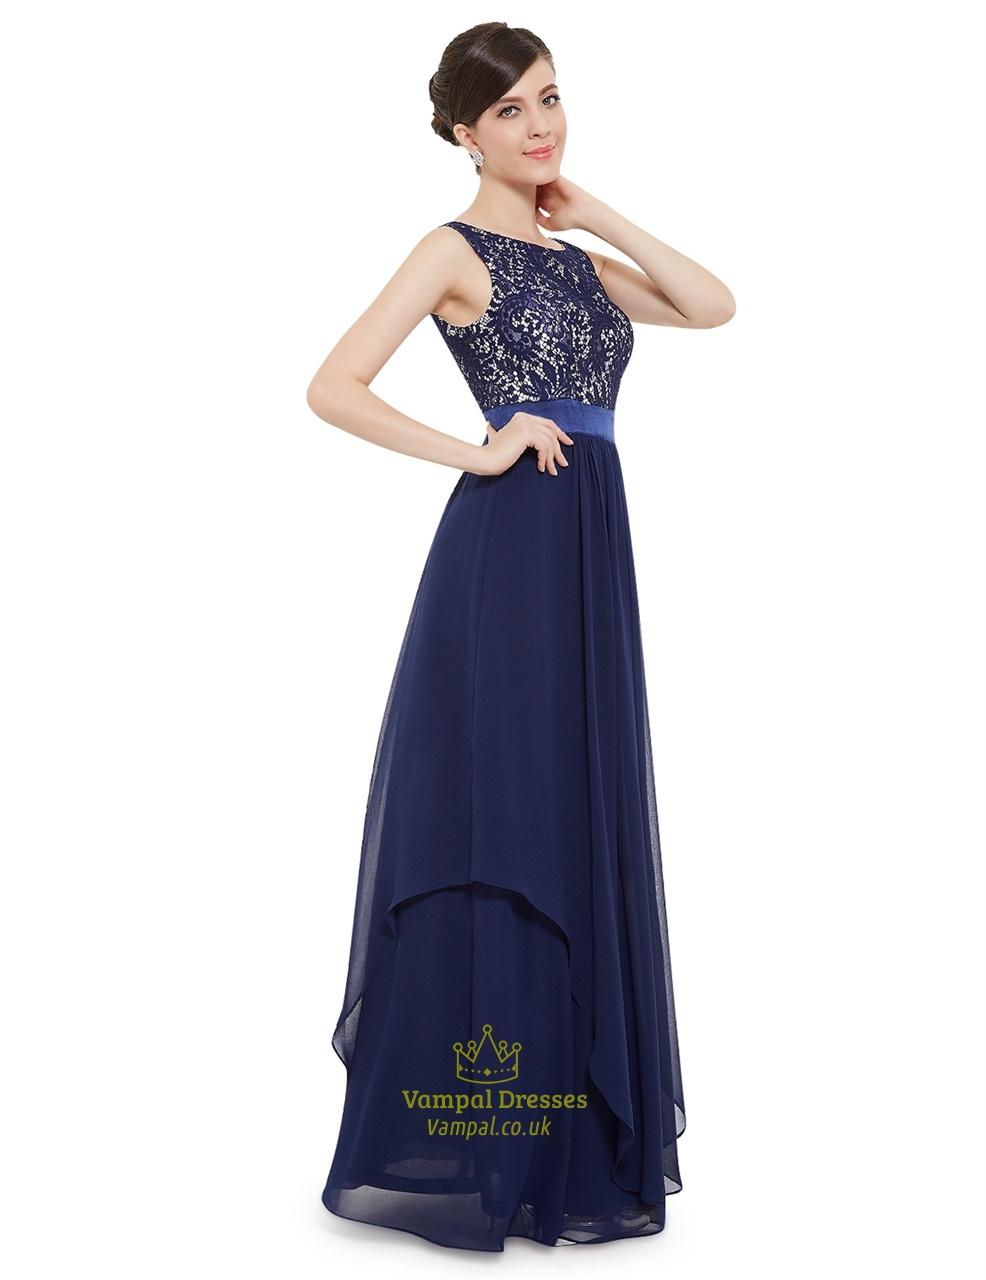 Elegant navy blue chiffon long bridesmaid dresses with lace bodice elegant navy blue chiffon long bridesmaid dresses with lace bodice ombrellifo Gallery